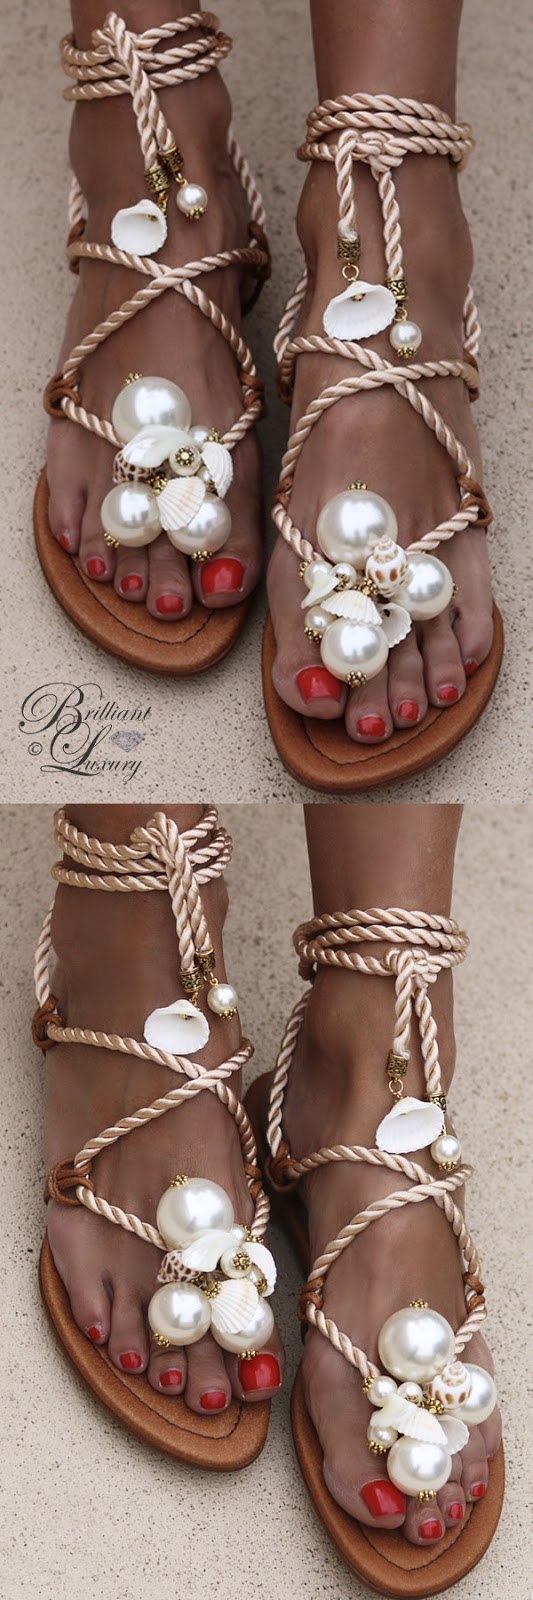 Brilliant Luxury ♦ Alameda Turquesa Ariel sandals